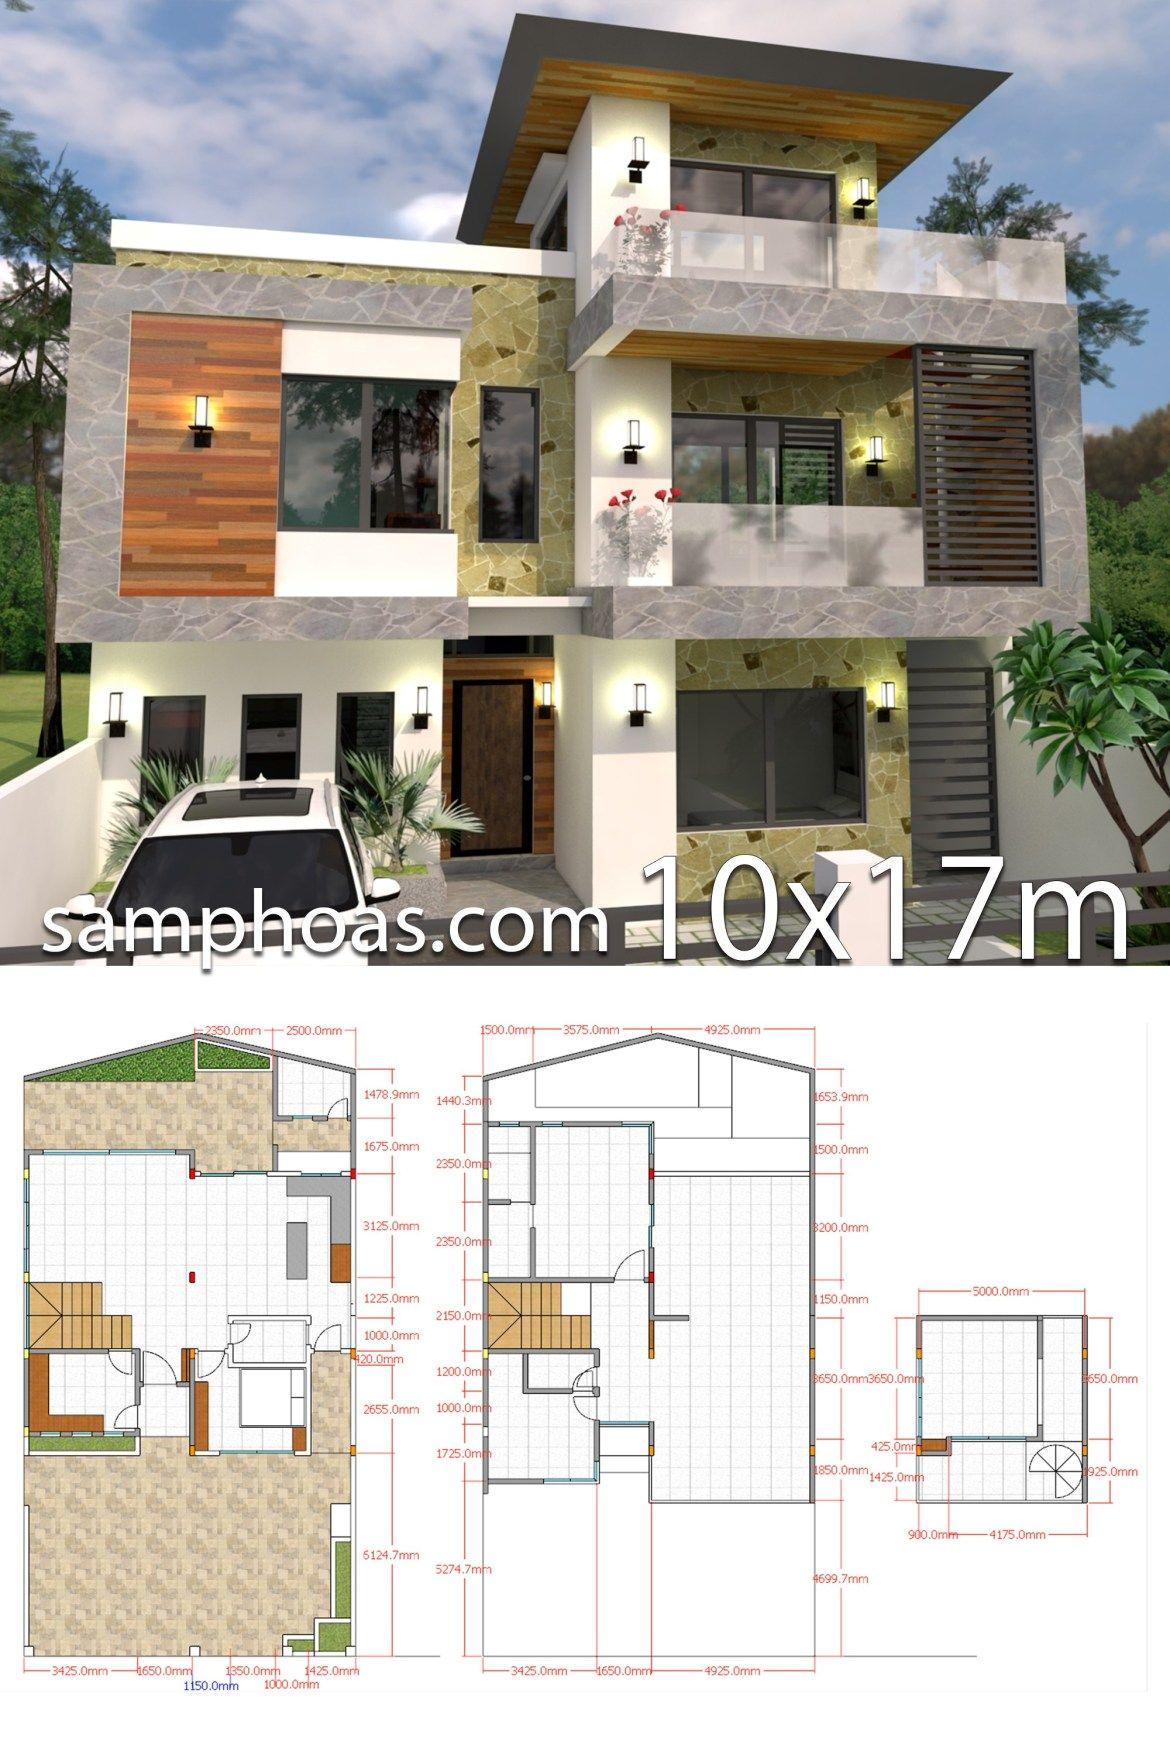 Plan 3d 5bedroom Home Design Plan 10x9m Full Plan Samphoas Plansearch Cool House Designs Modern Style House Plans House Design